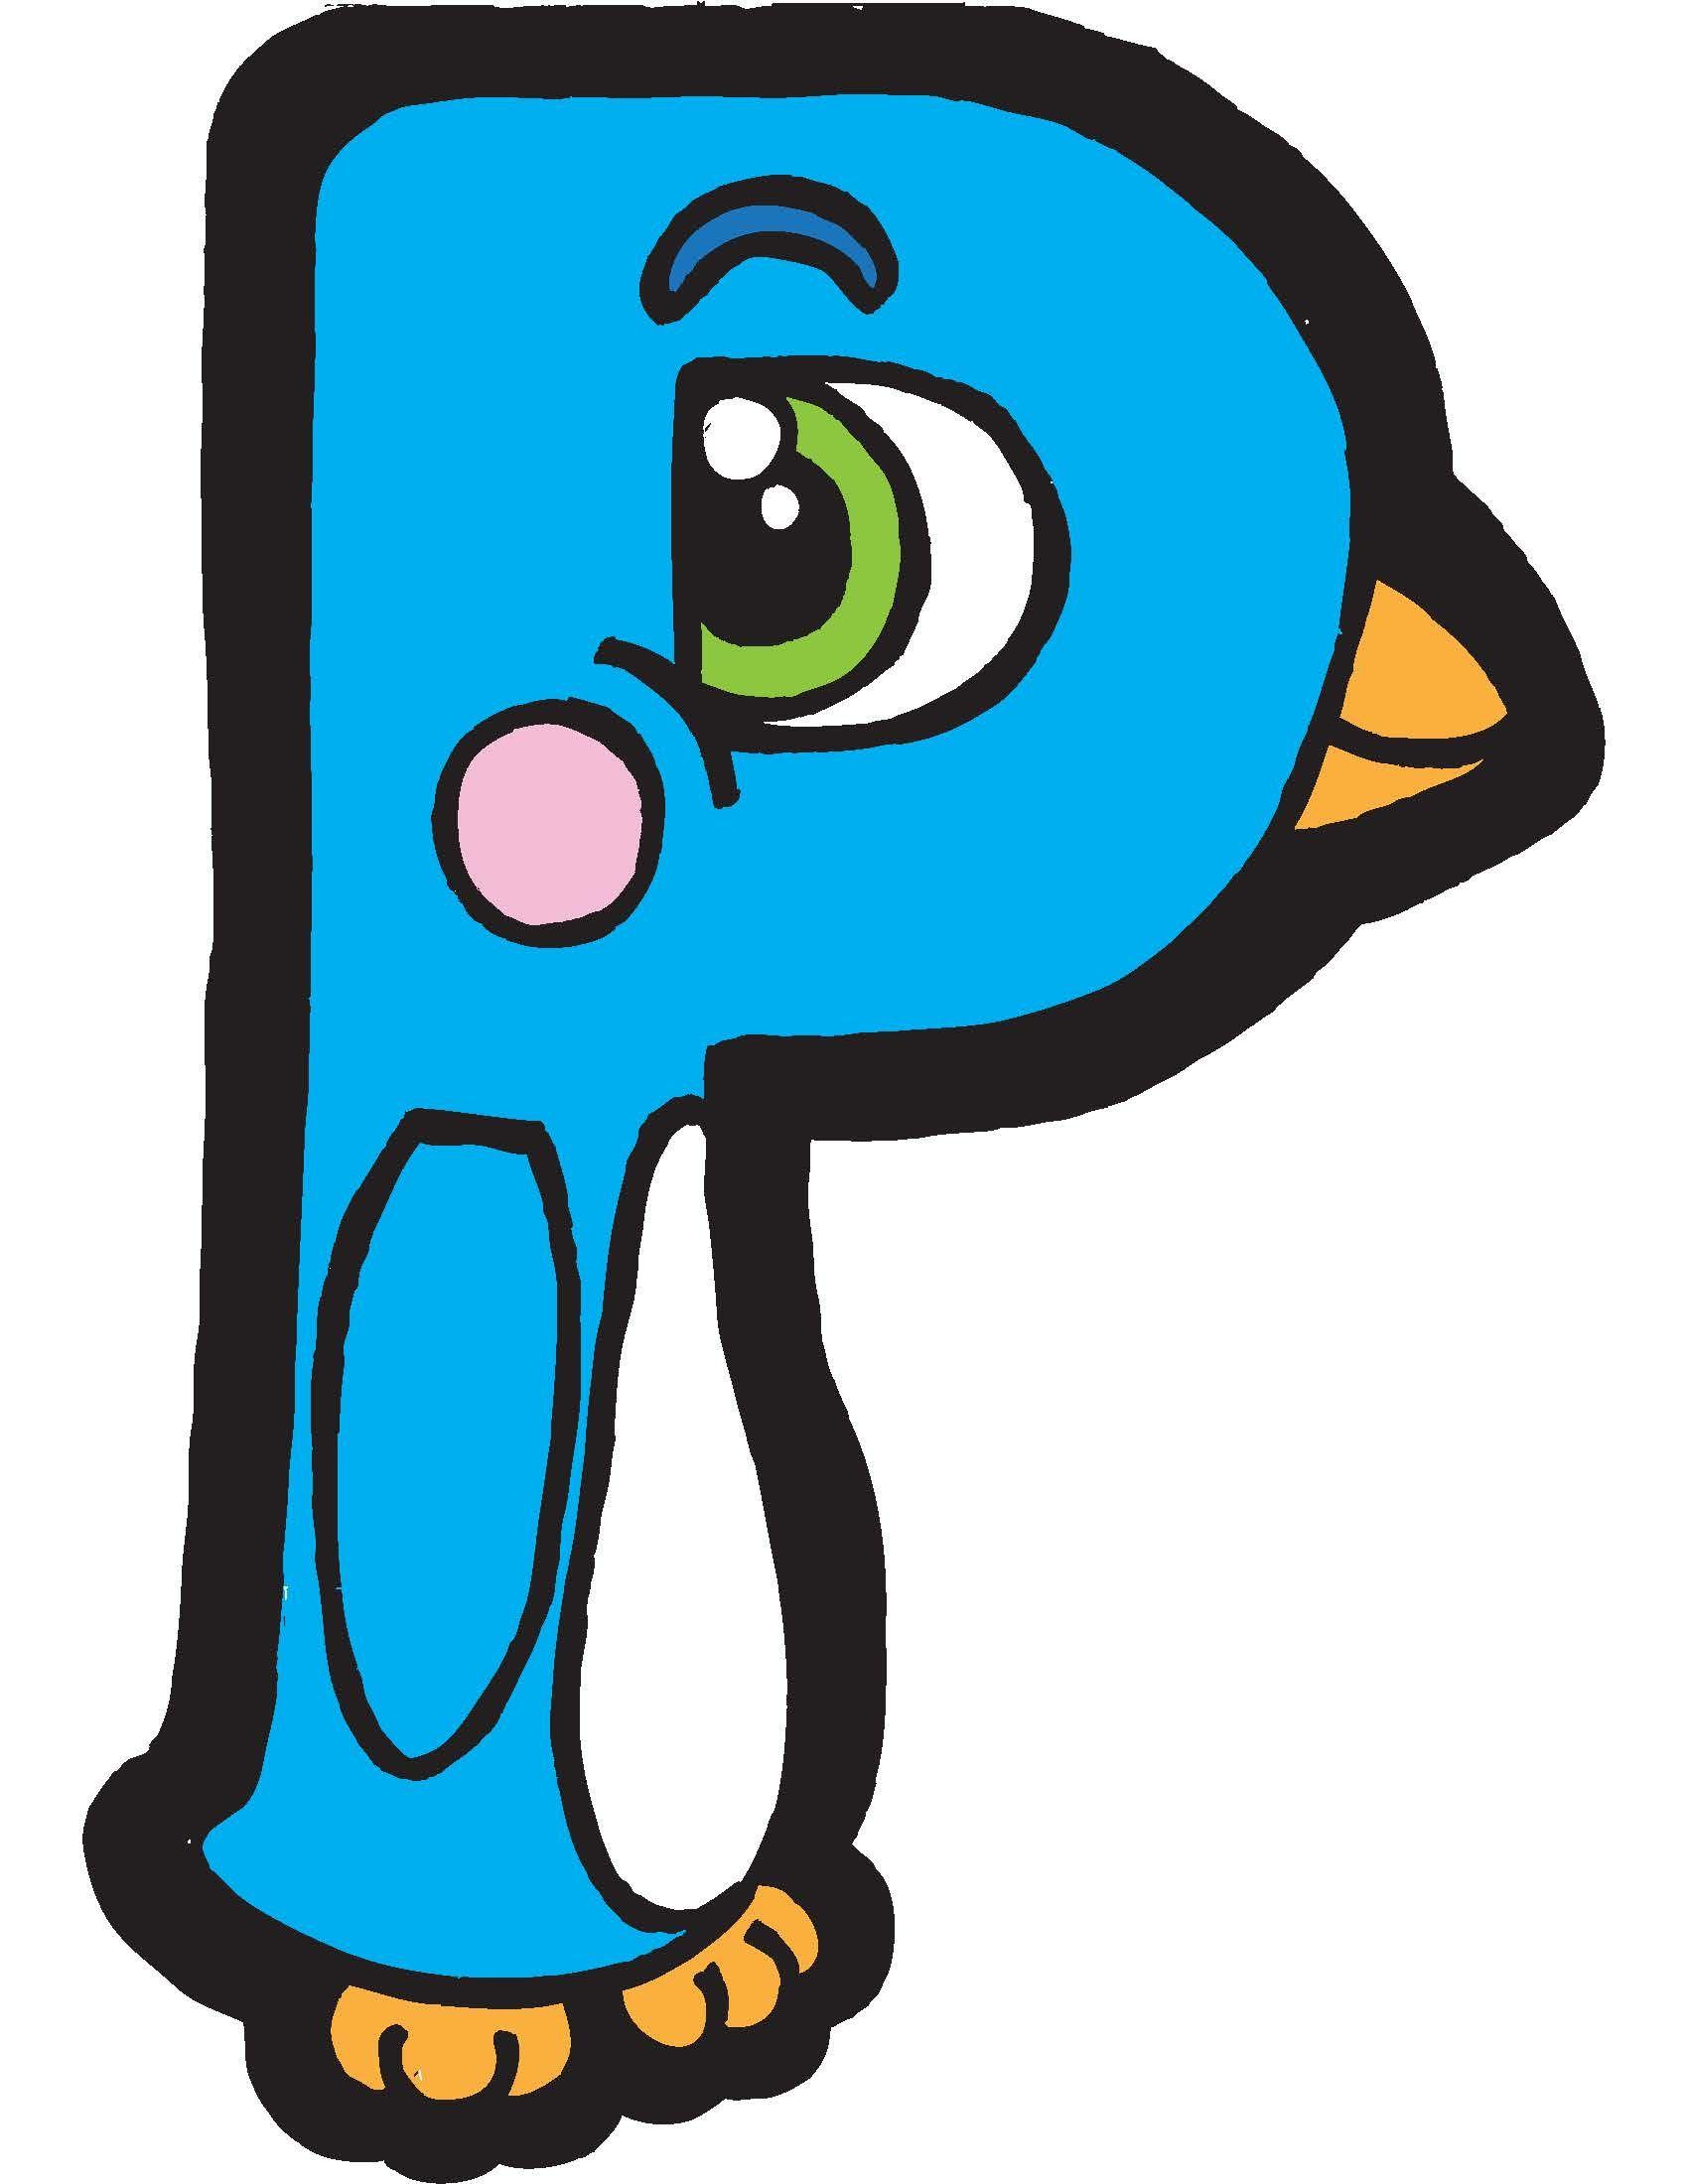 P Penguin Alphapet By Brendan Klos Brendanklos